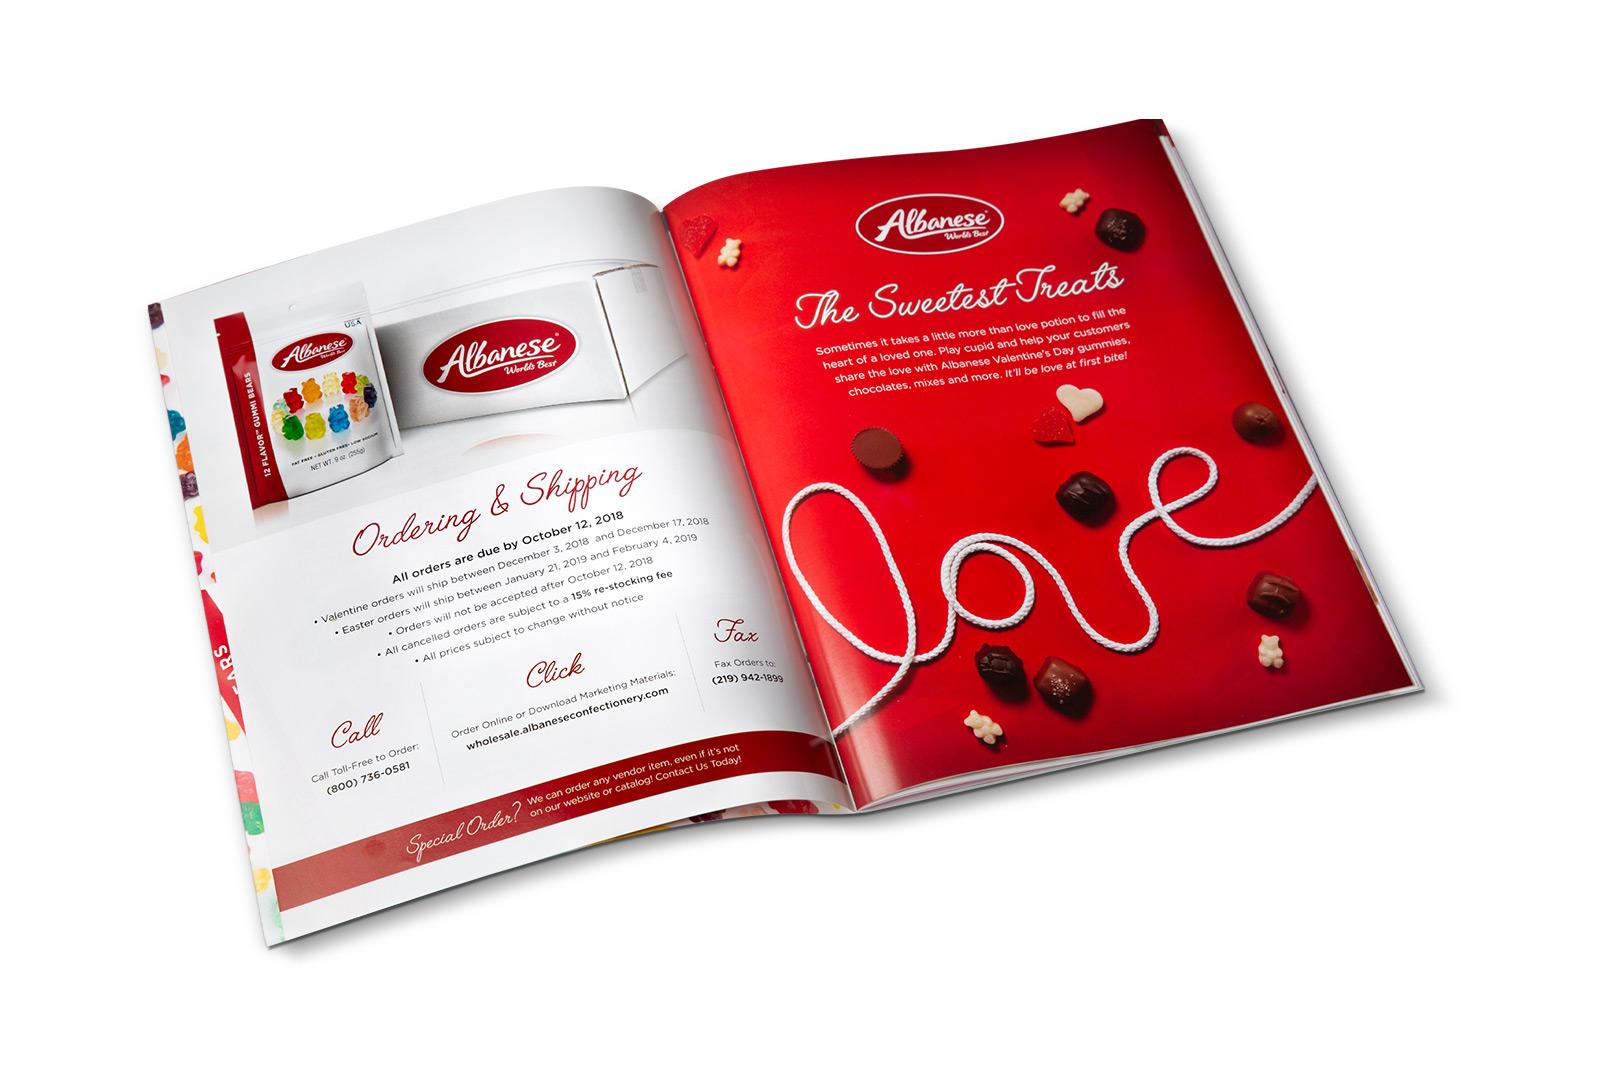 Albanese confectionary treats catalog spread design